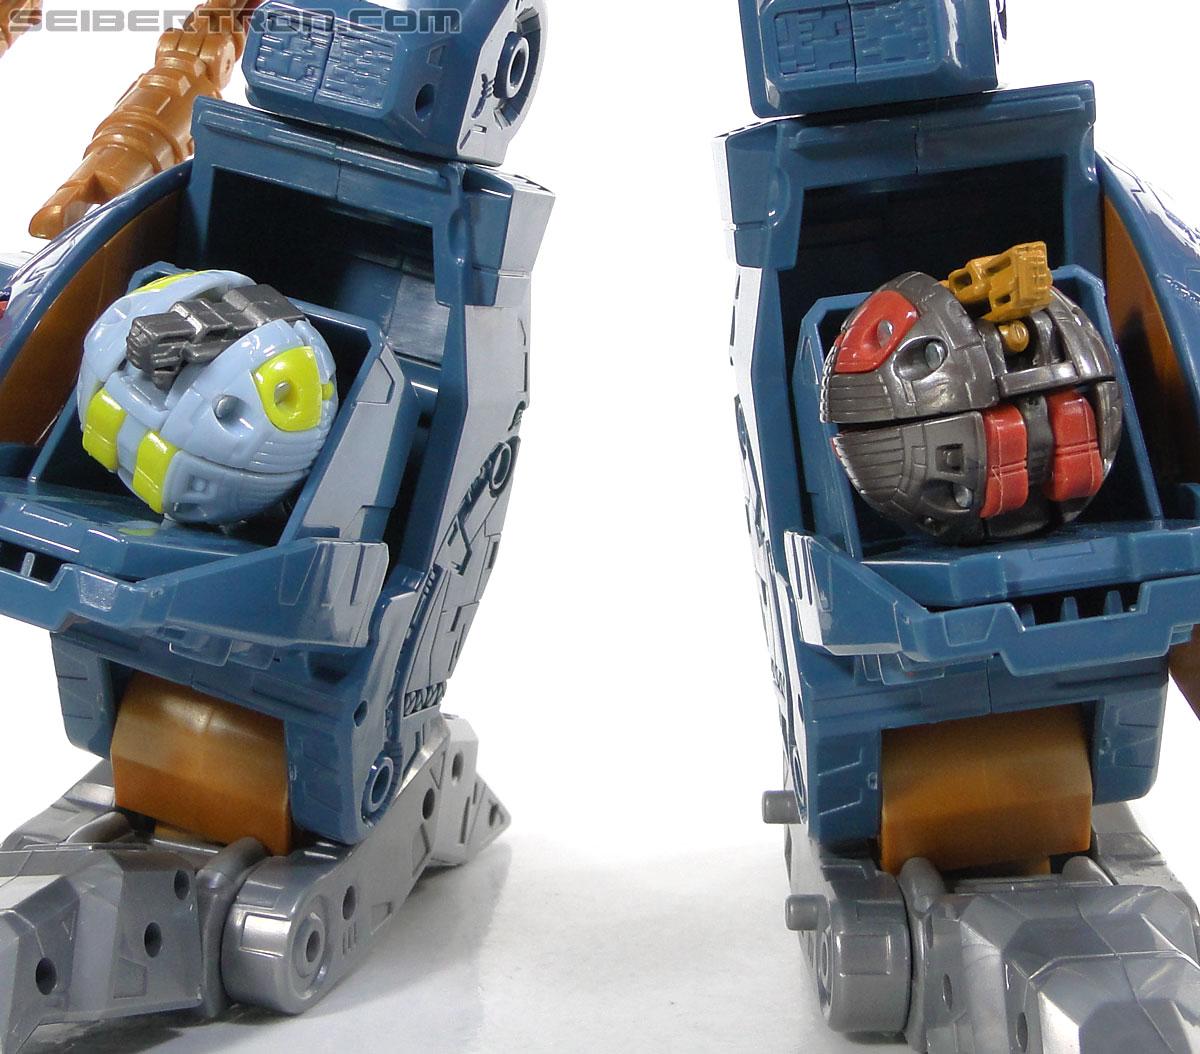 Transformers Generations Unicron (25th Anniversary) (Universal Dominator Unicron) (Image #248 of 262)